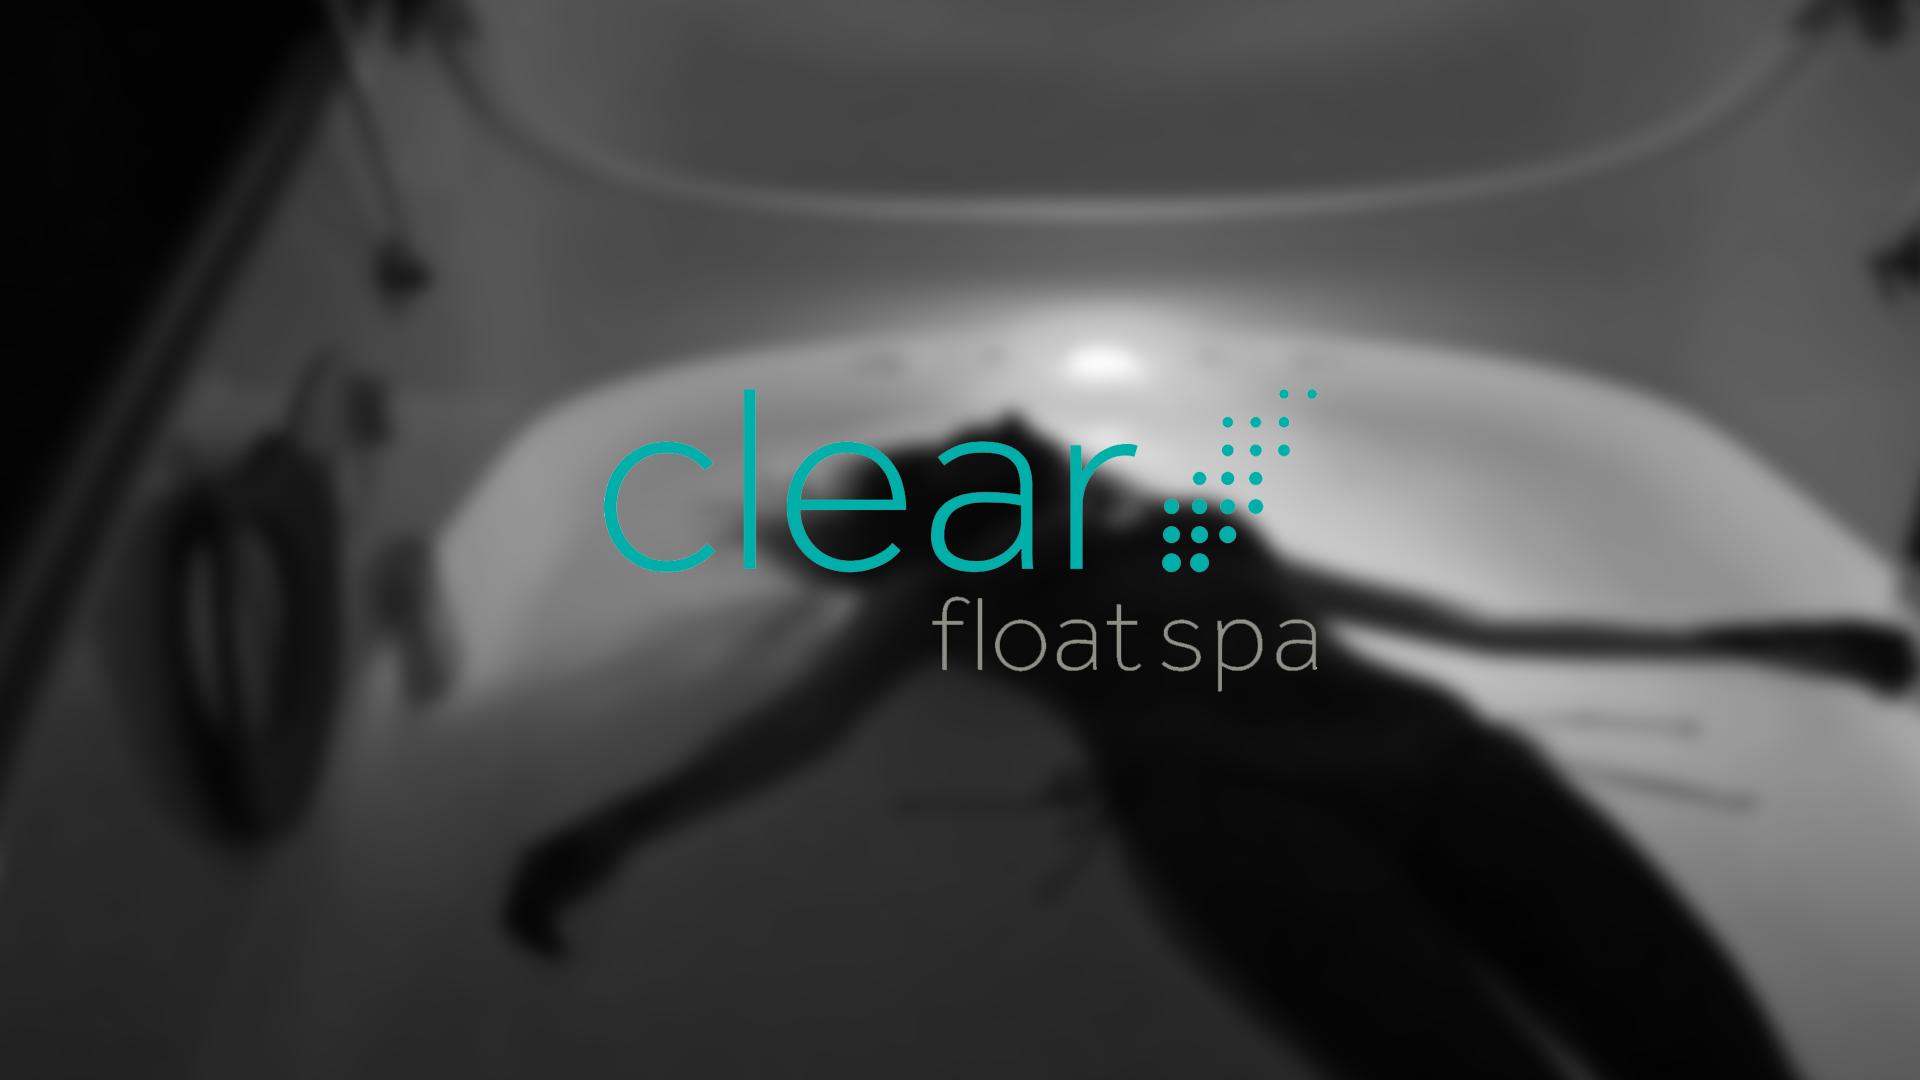 ClearFloatSpa.png